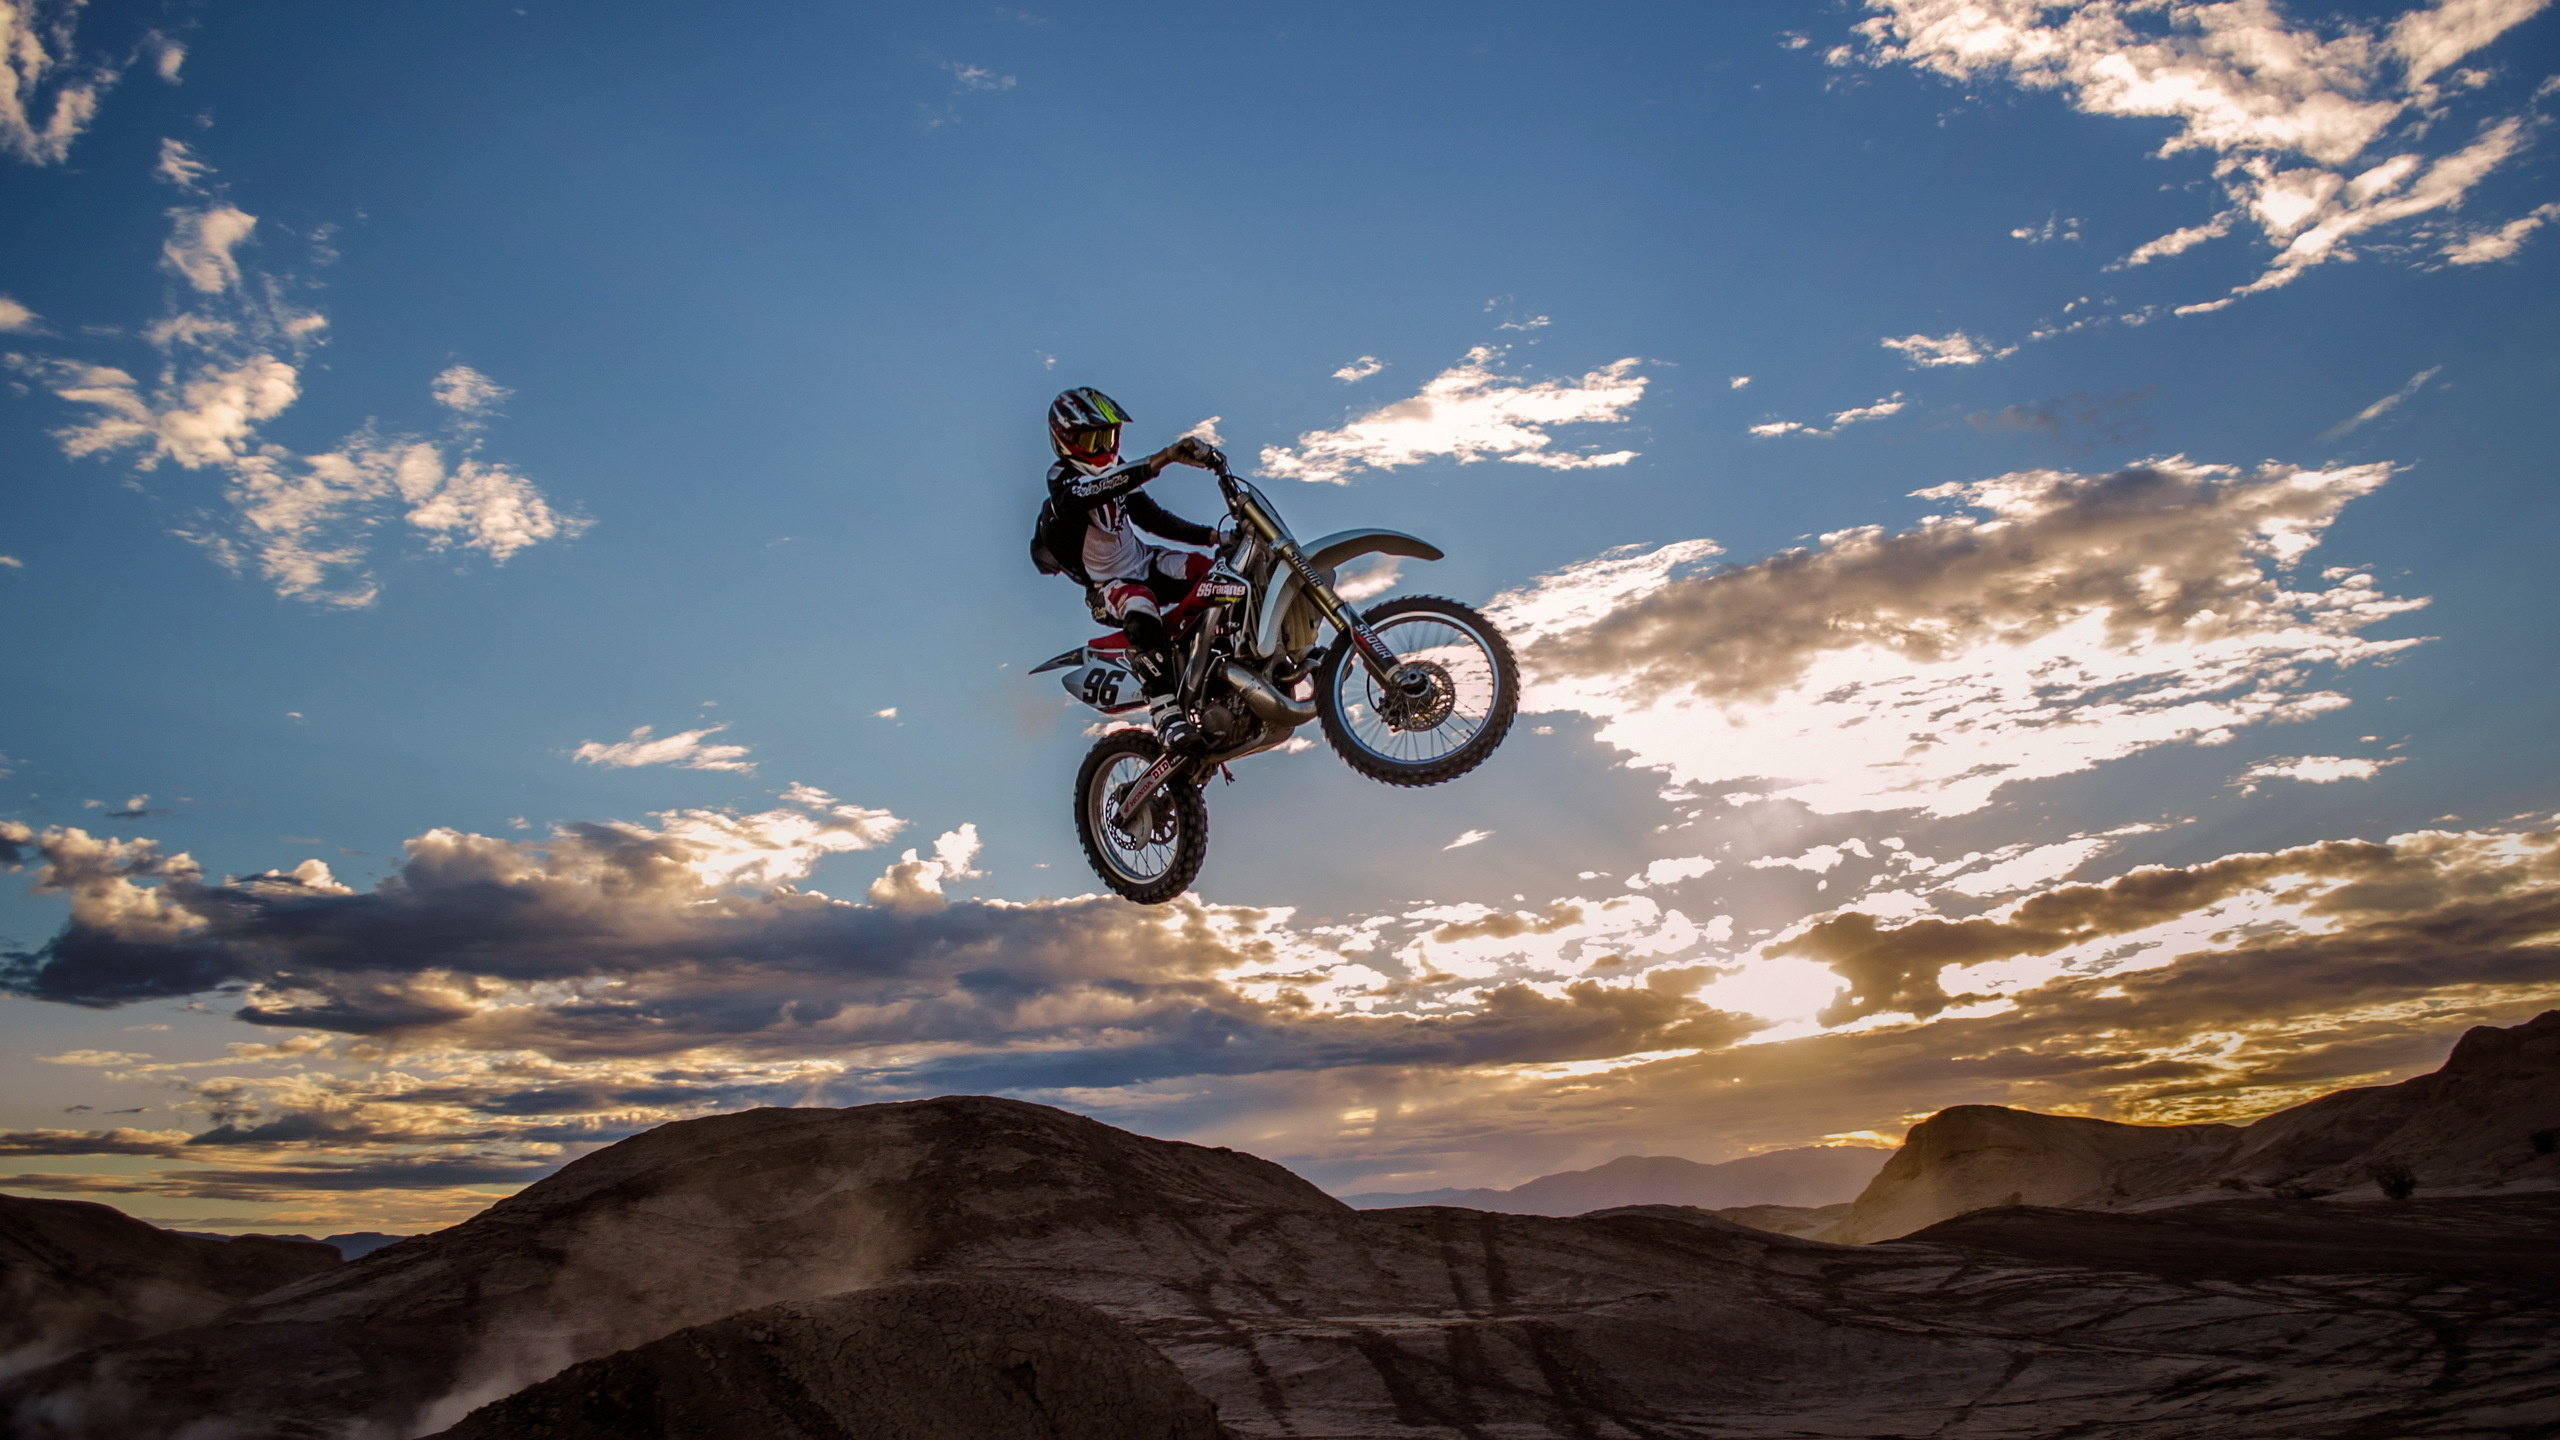 Awesome Motocross Dirt Bike Free Wallpaper ID378392 For Hd 2560x1440 Desktop